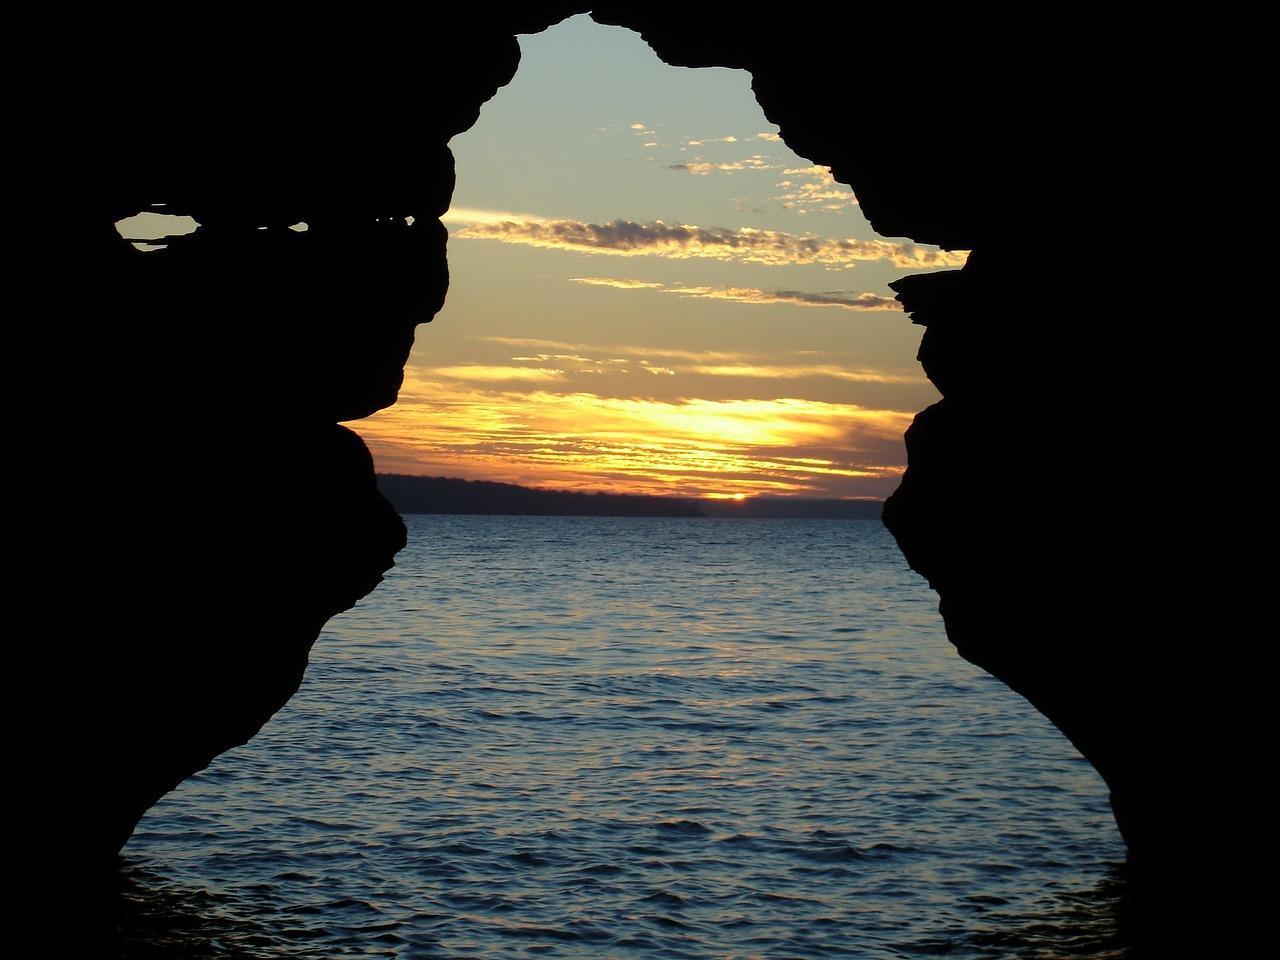 sunset-1814445_1280.jpg